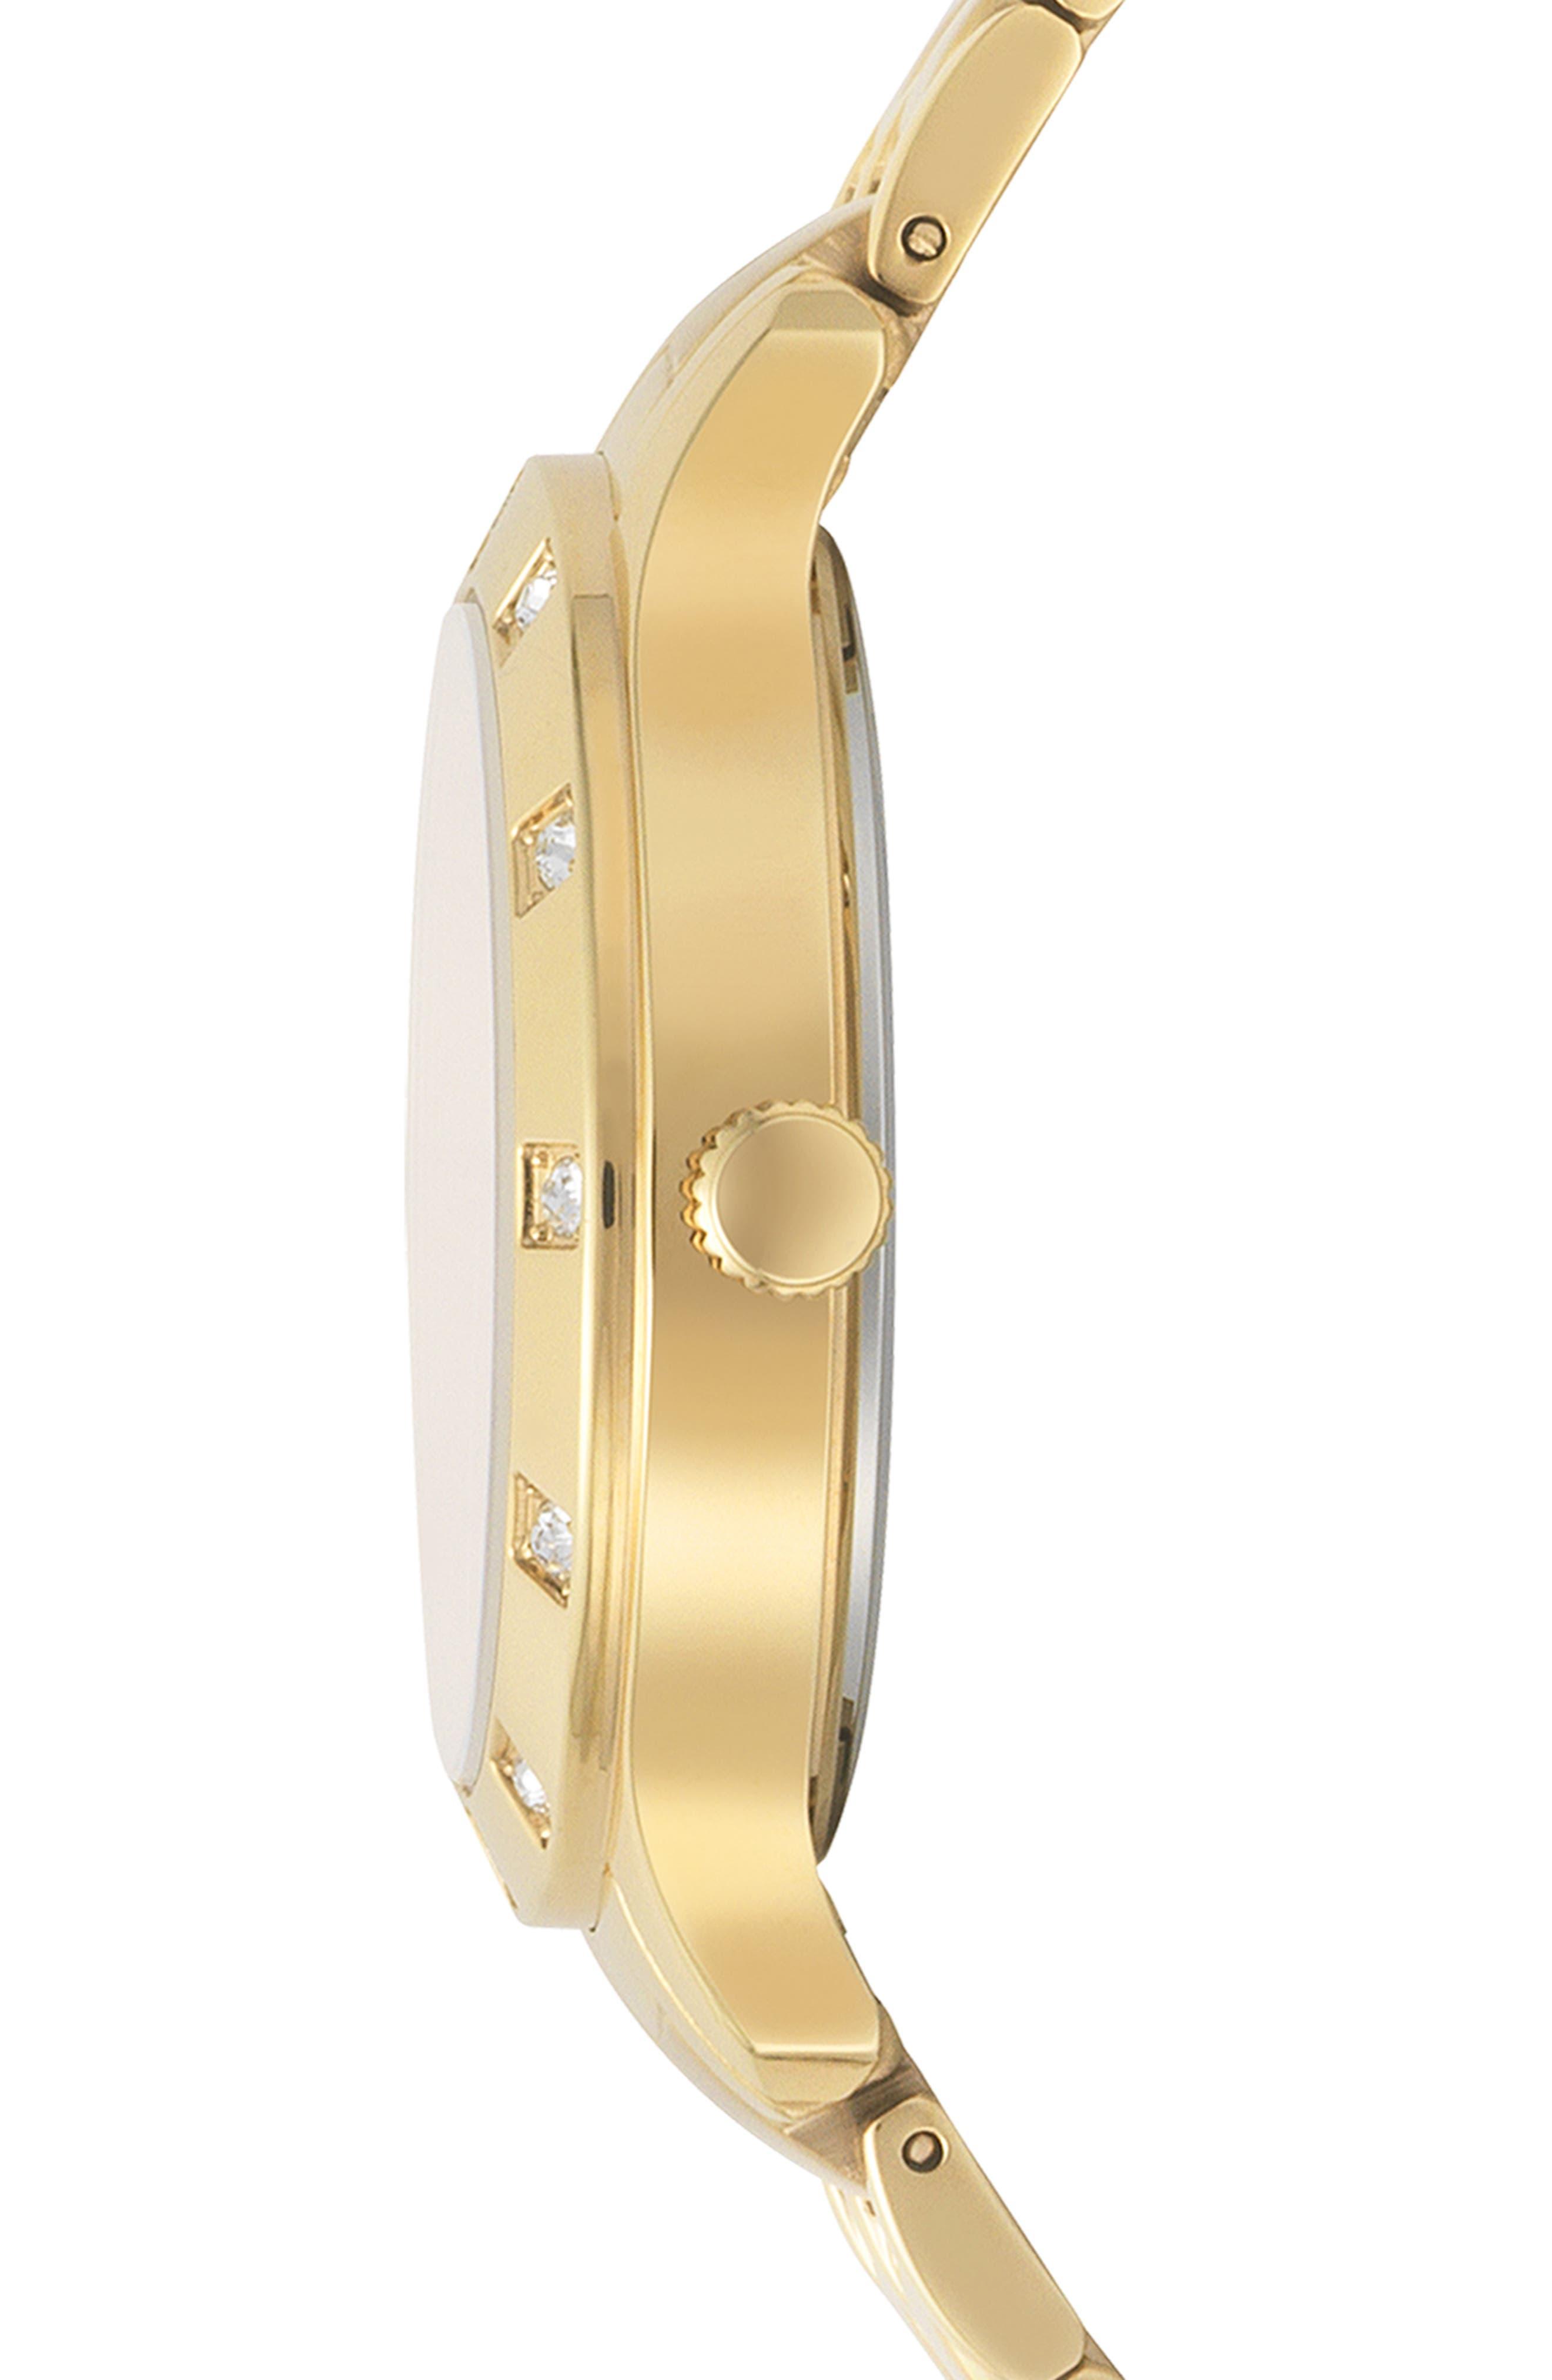 VERSUS VERSACE, Brackenfell Swarovski Bracelet Watch, 38mm, Alternate thumbnail 2, color, GOLD/ BLUE